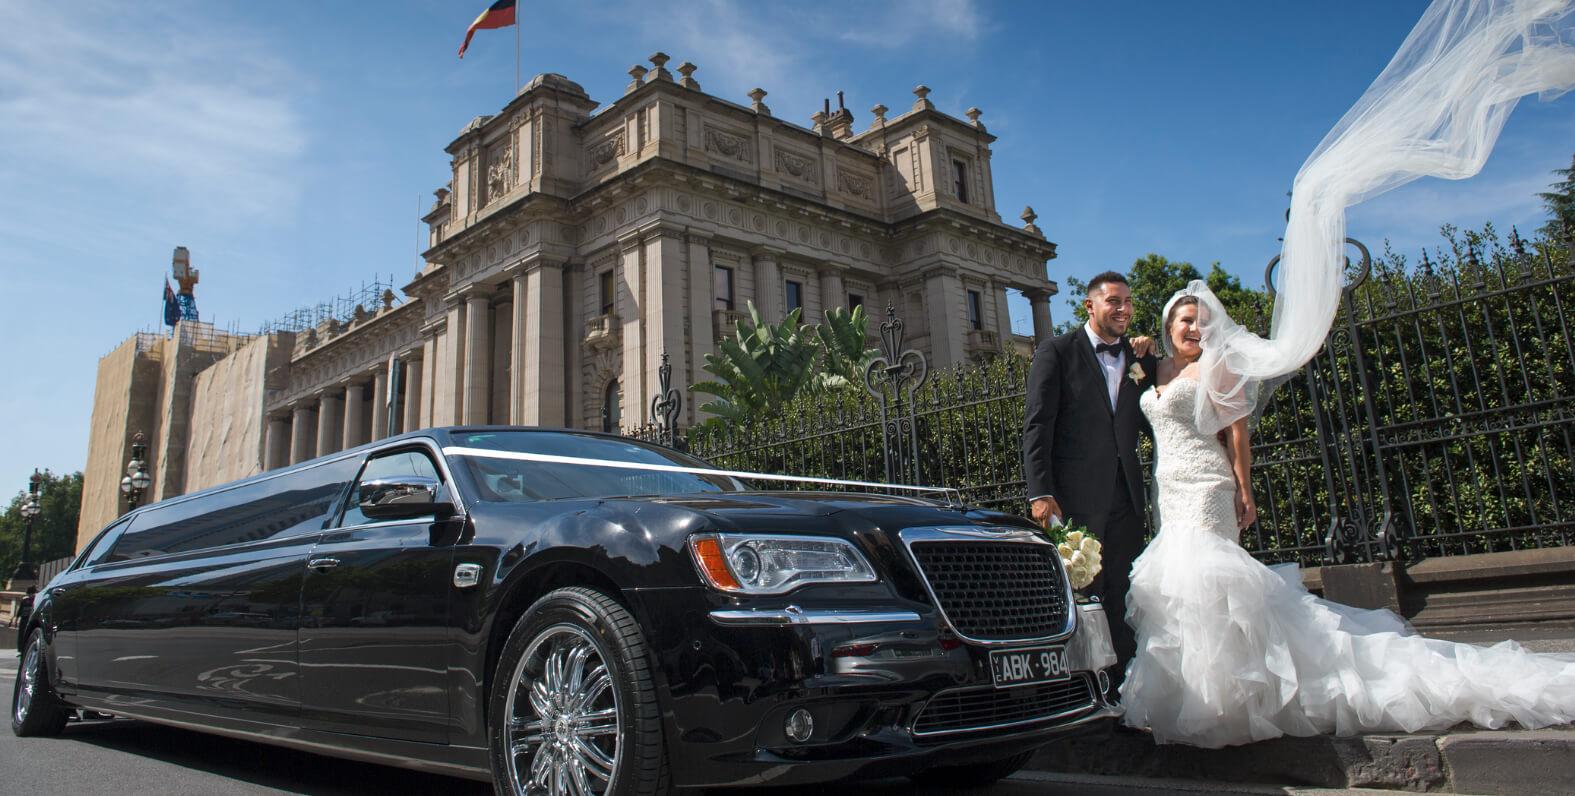 Black Chrysler luxury limousine Wedding Car